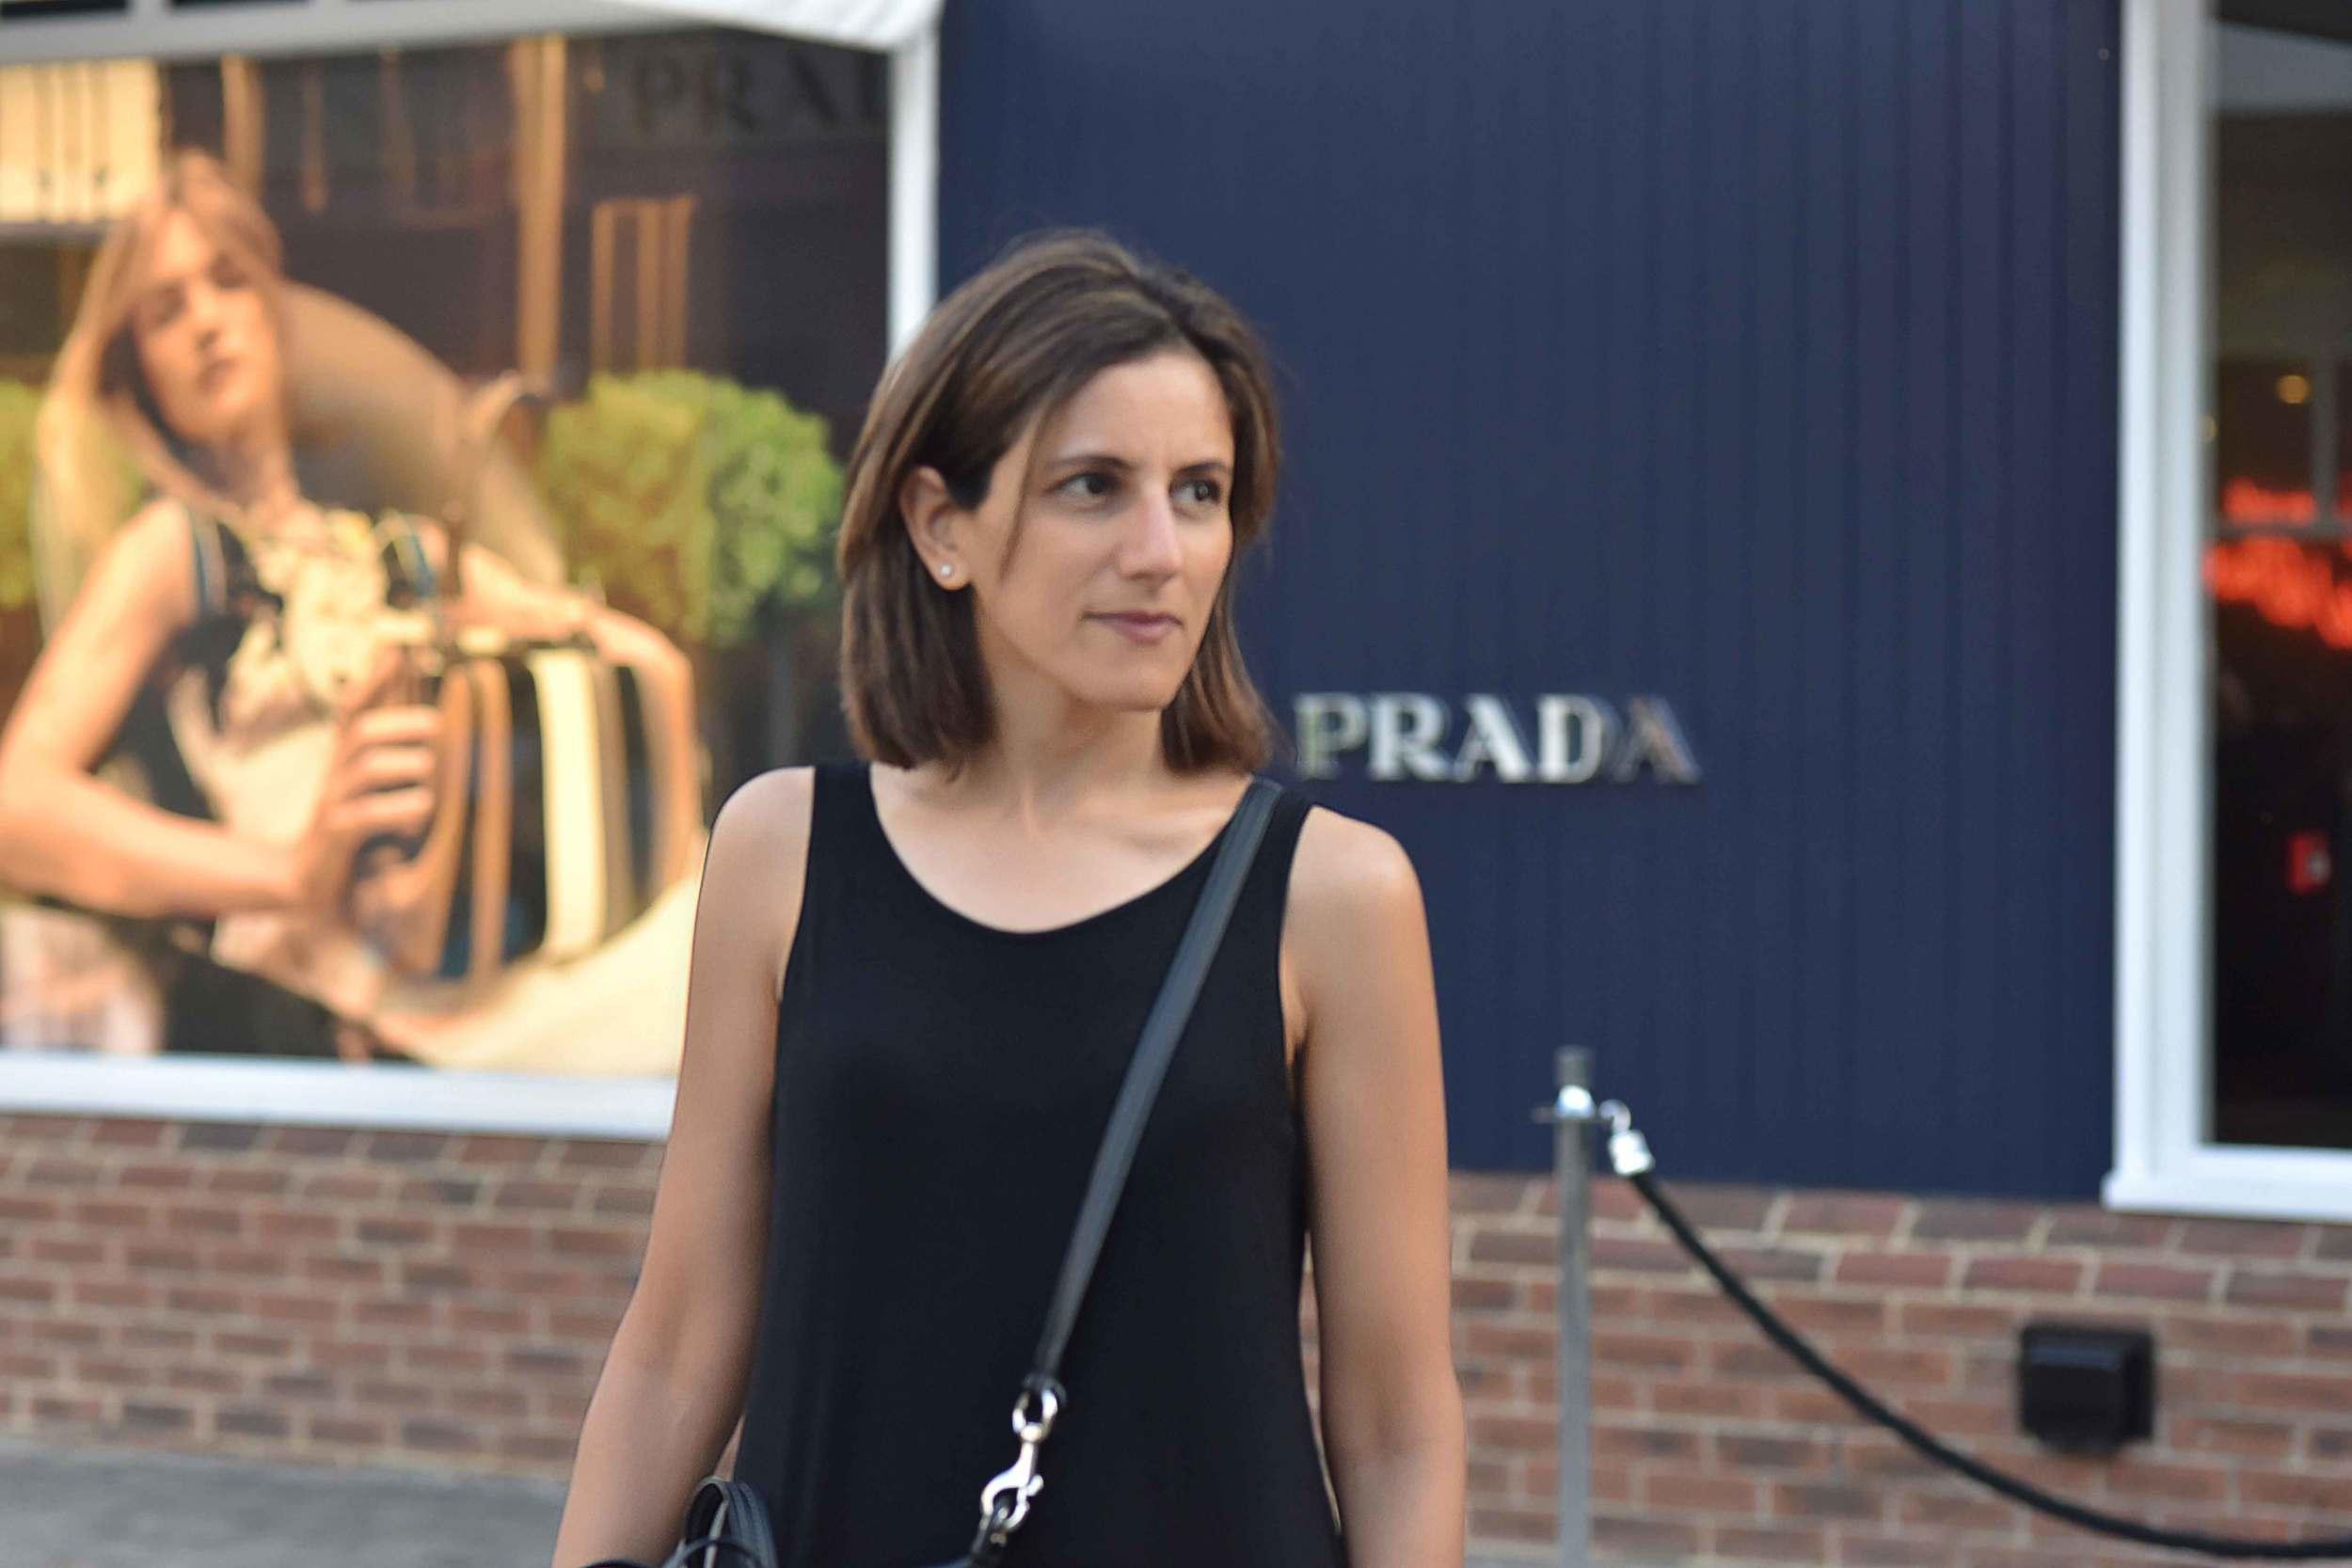 outside Prada store, Eileen Fisher jersey tank dress, Bicester village, designer shopping outlet near London, UK. Image©sourcingstyle.com